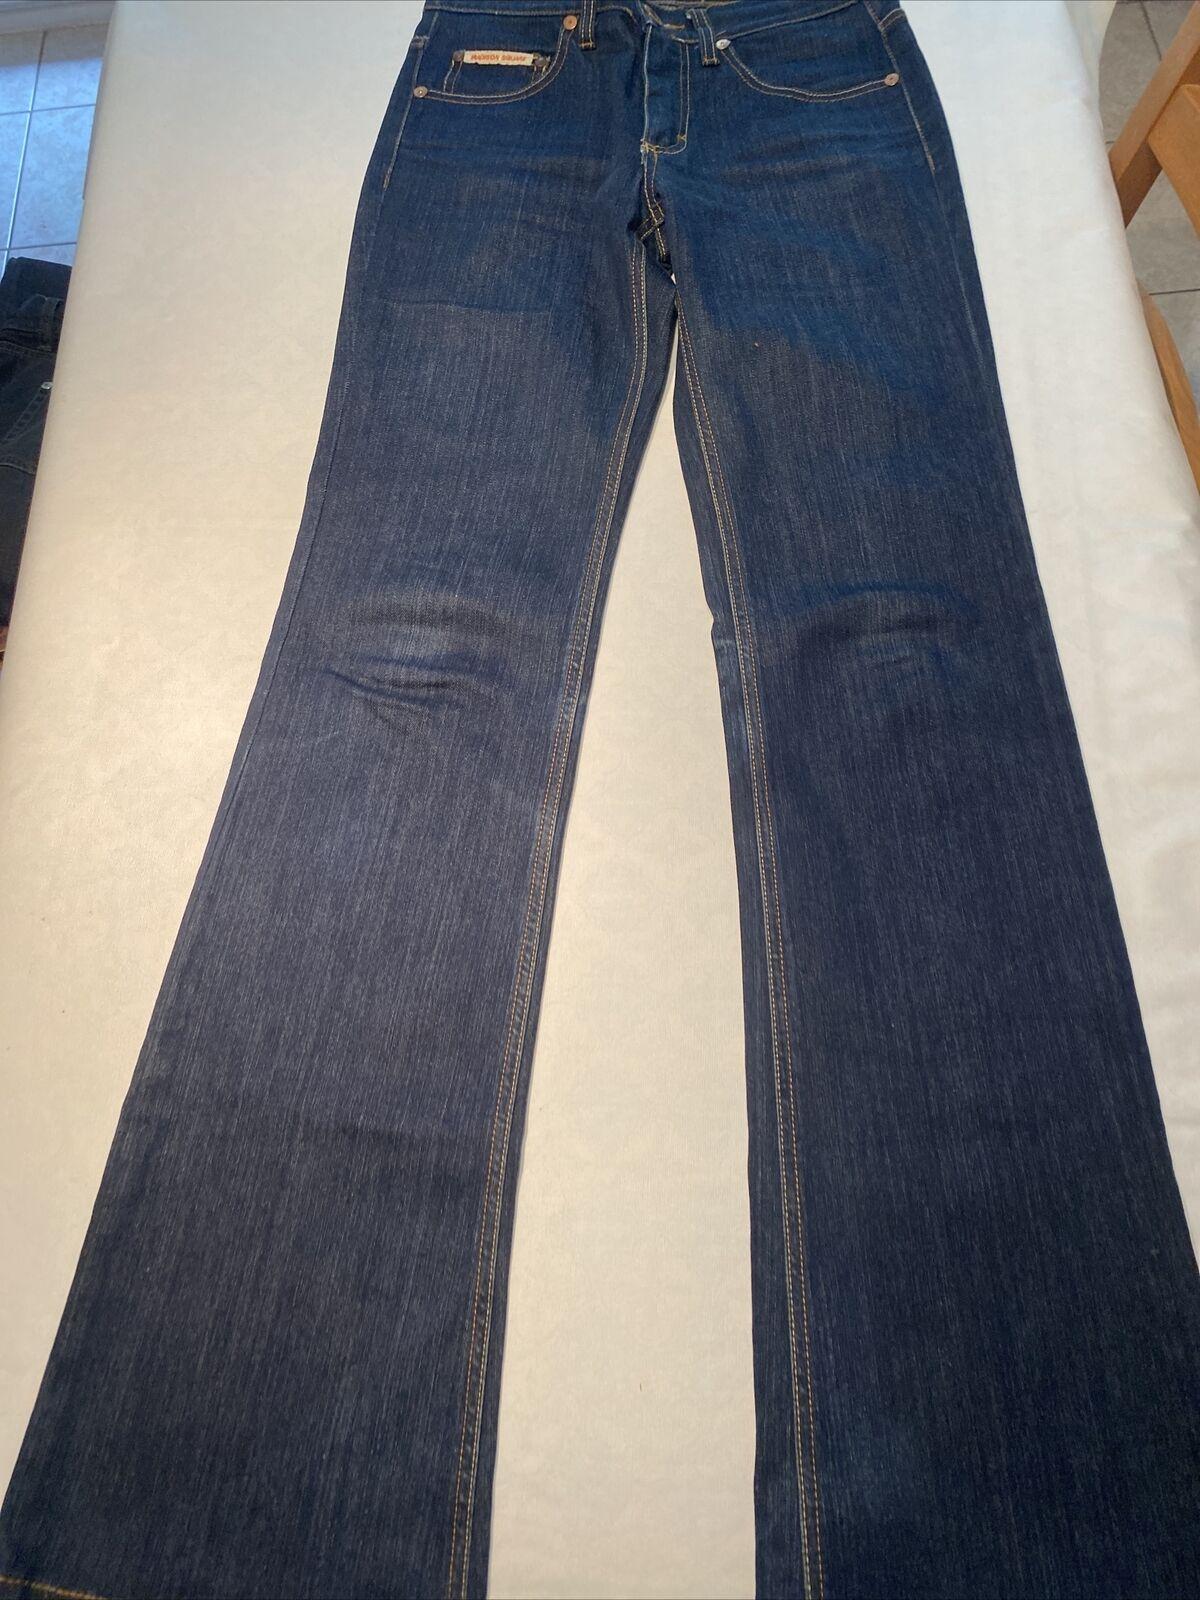 ♥Madison Square Jeans Hose Tag 26/ Größe 36, Gebrauchter Guter Zustand